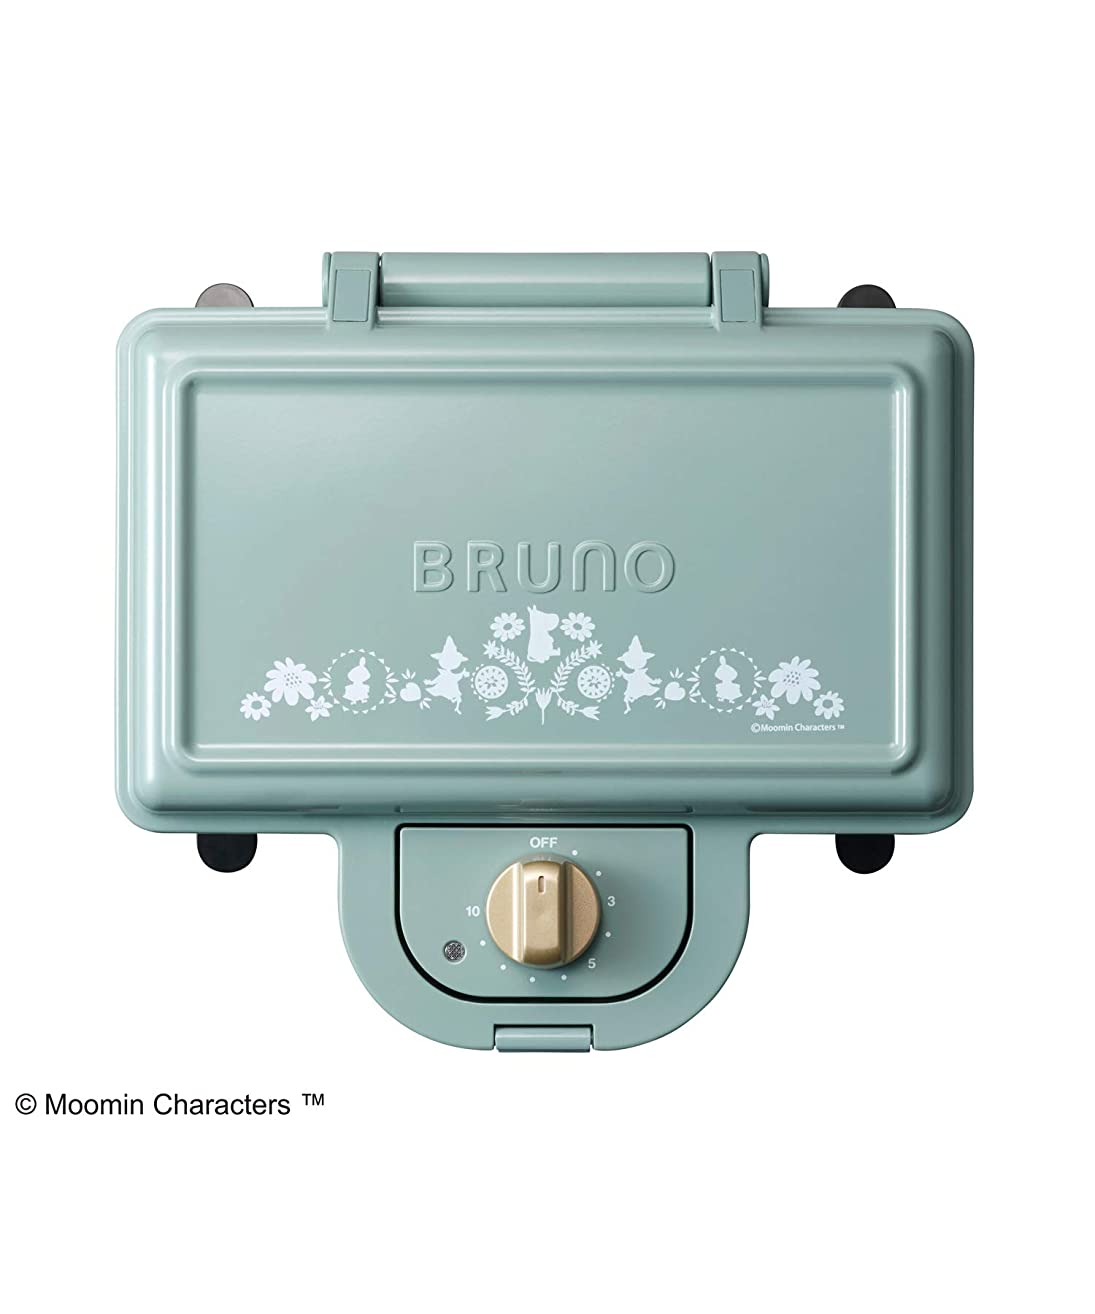 BRUNO ホットサンドメーカー ダブルサイズ ムーミン ブルーグレー 耳まで焼ける